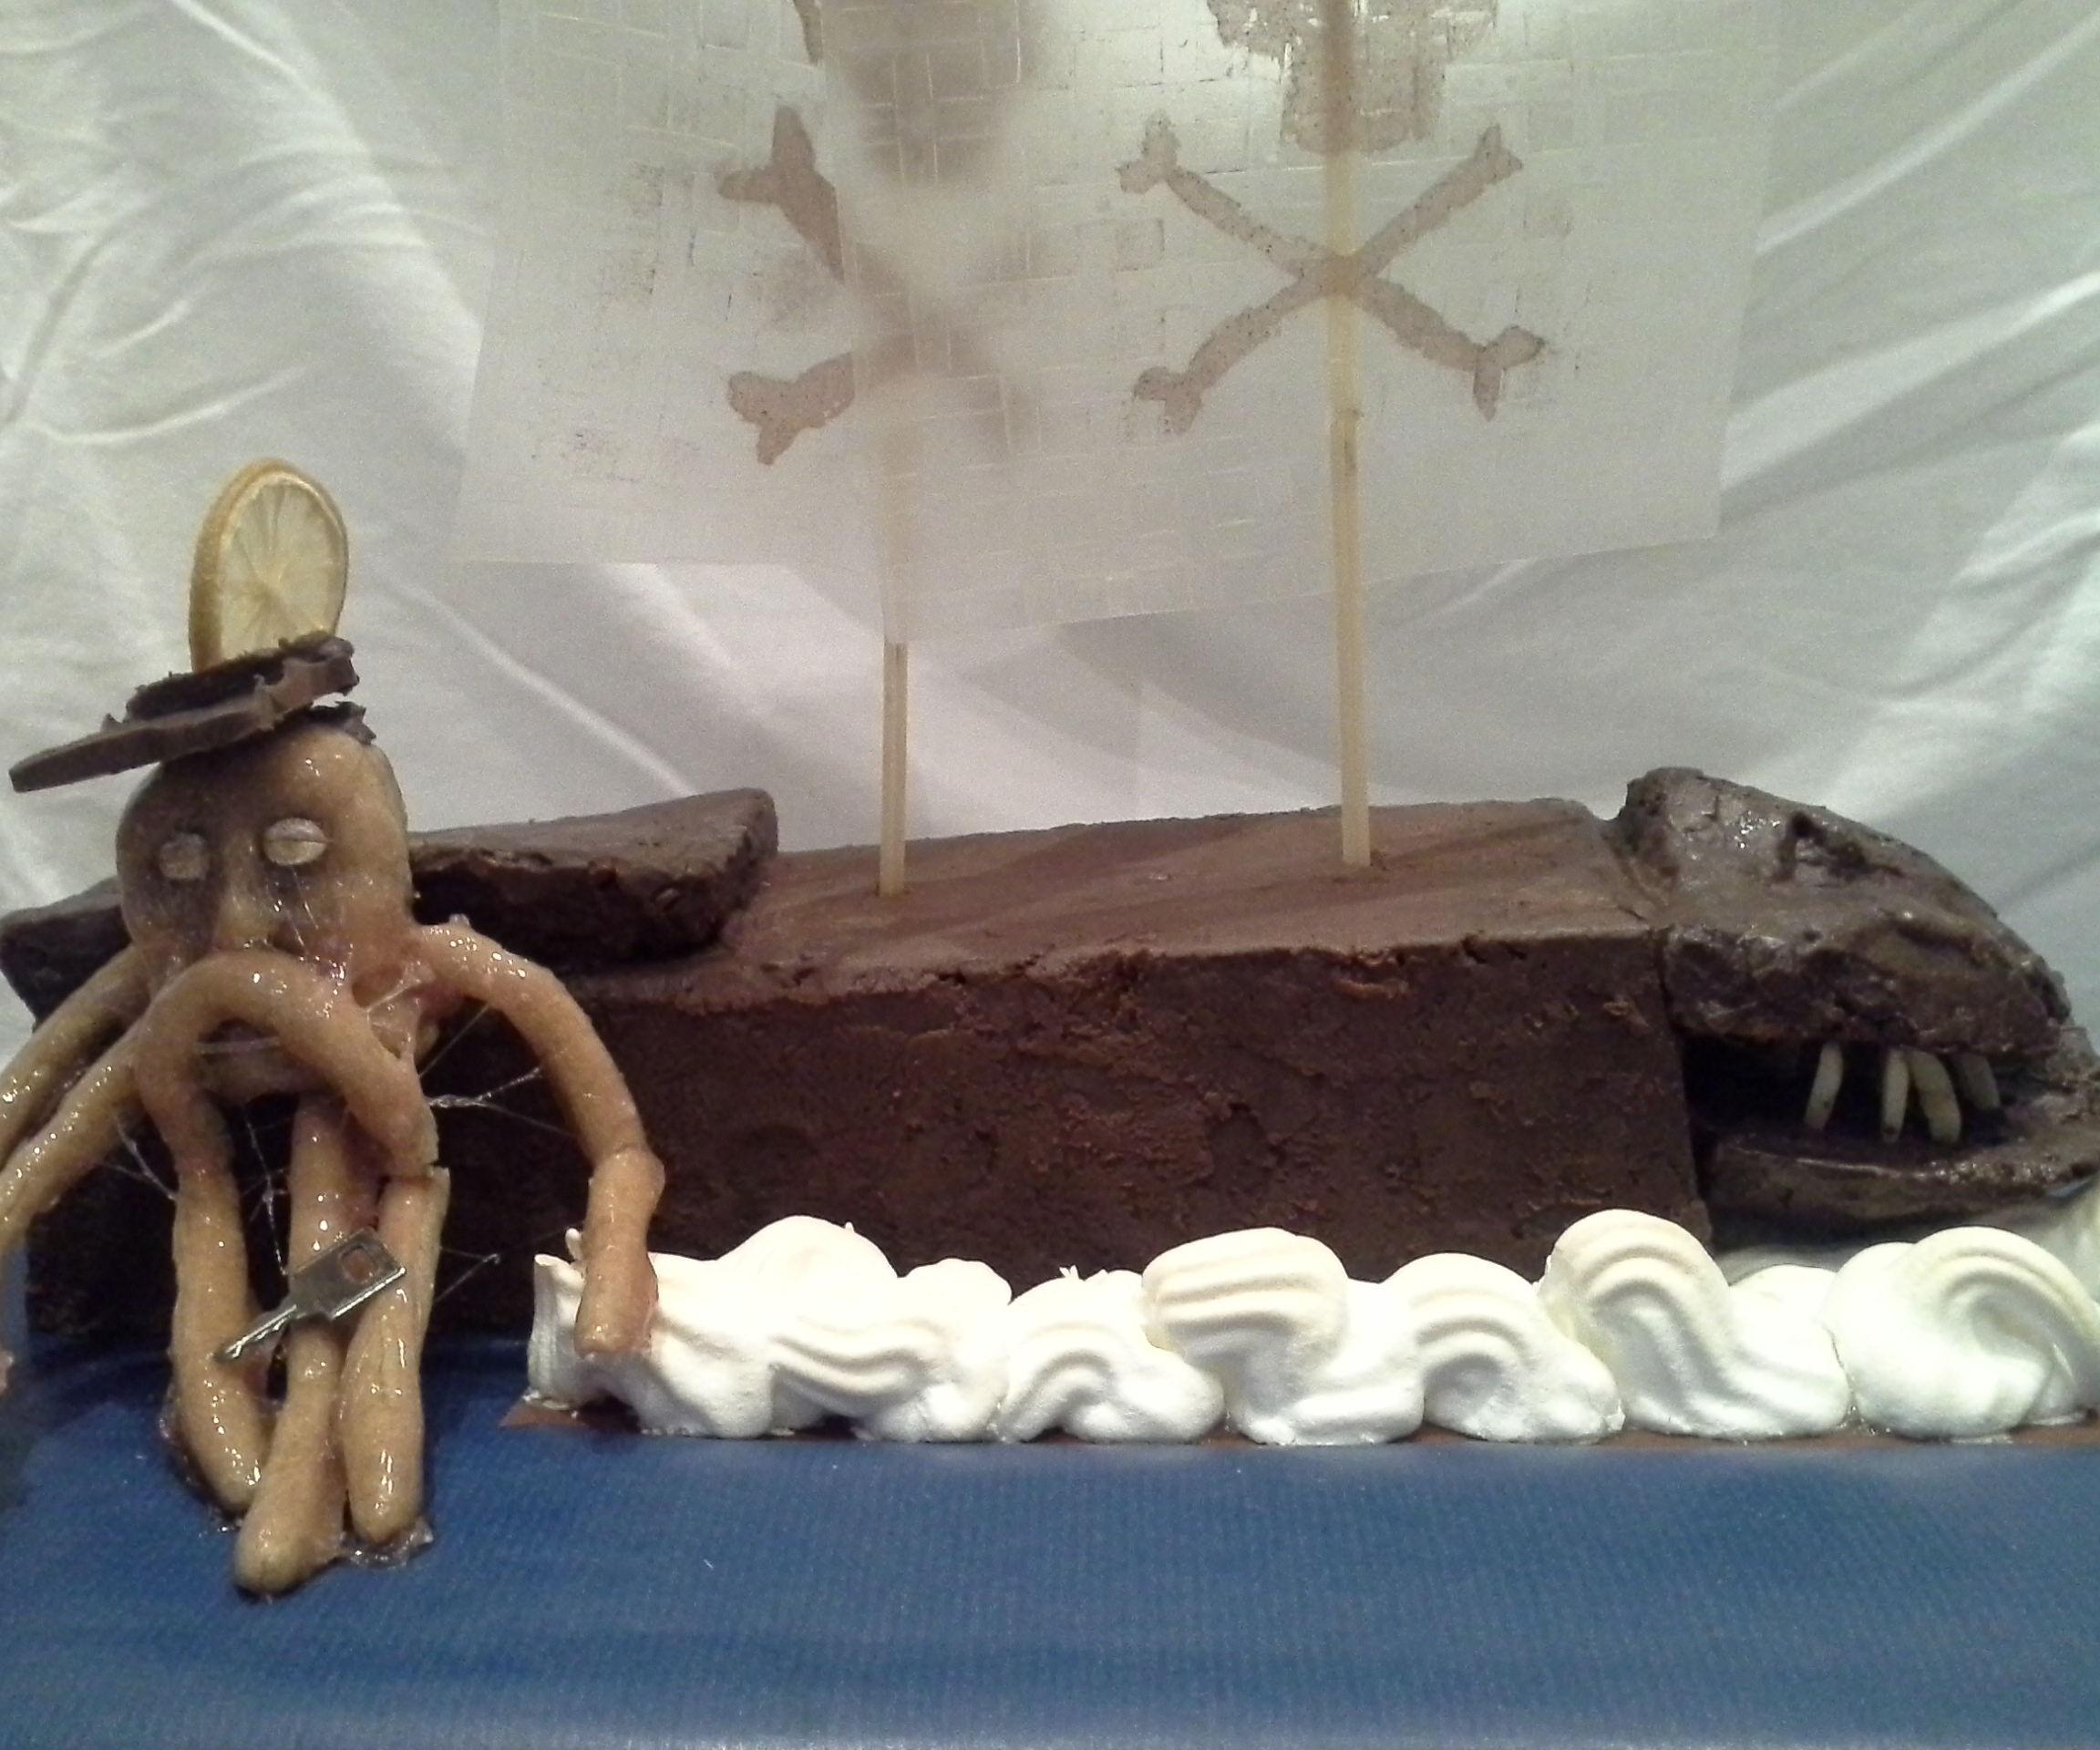 Flying Dutchman cake